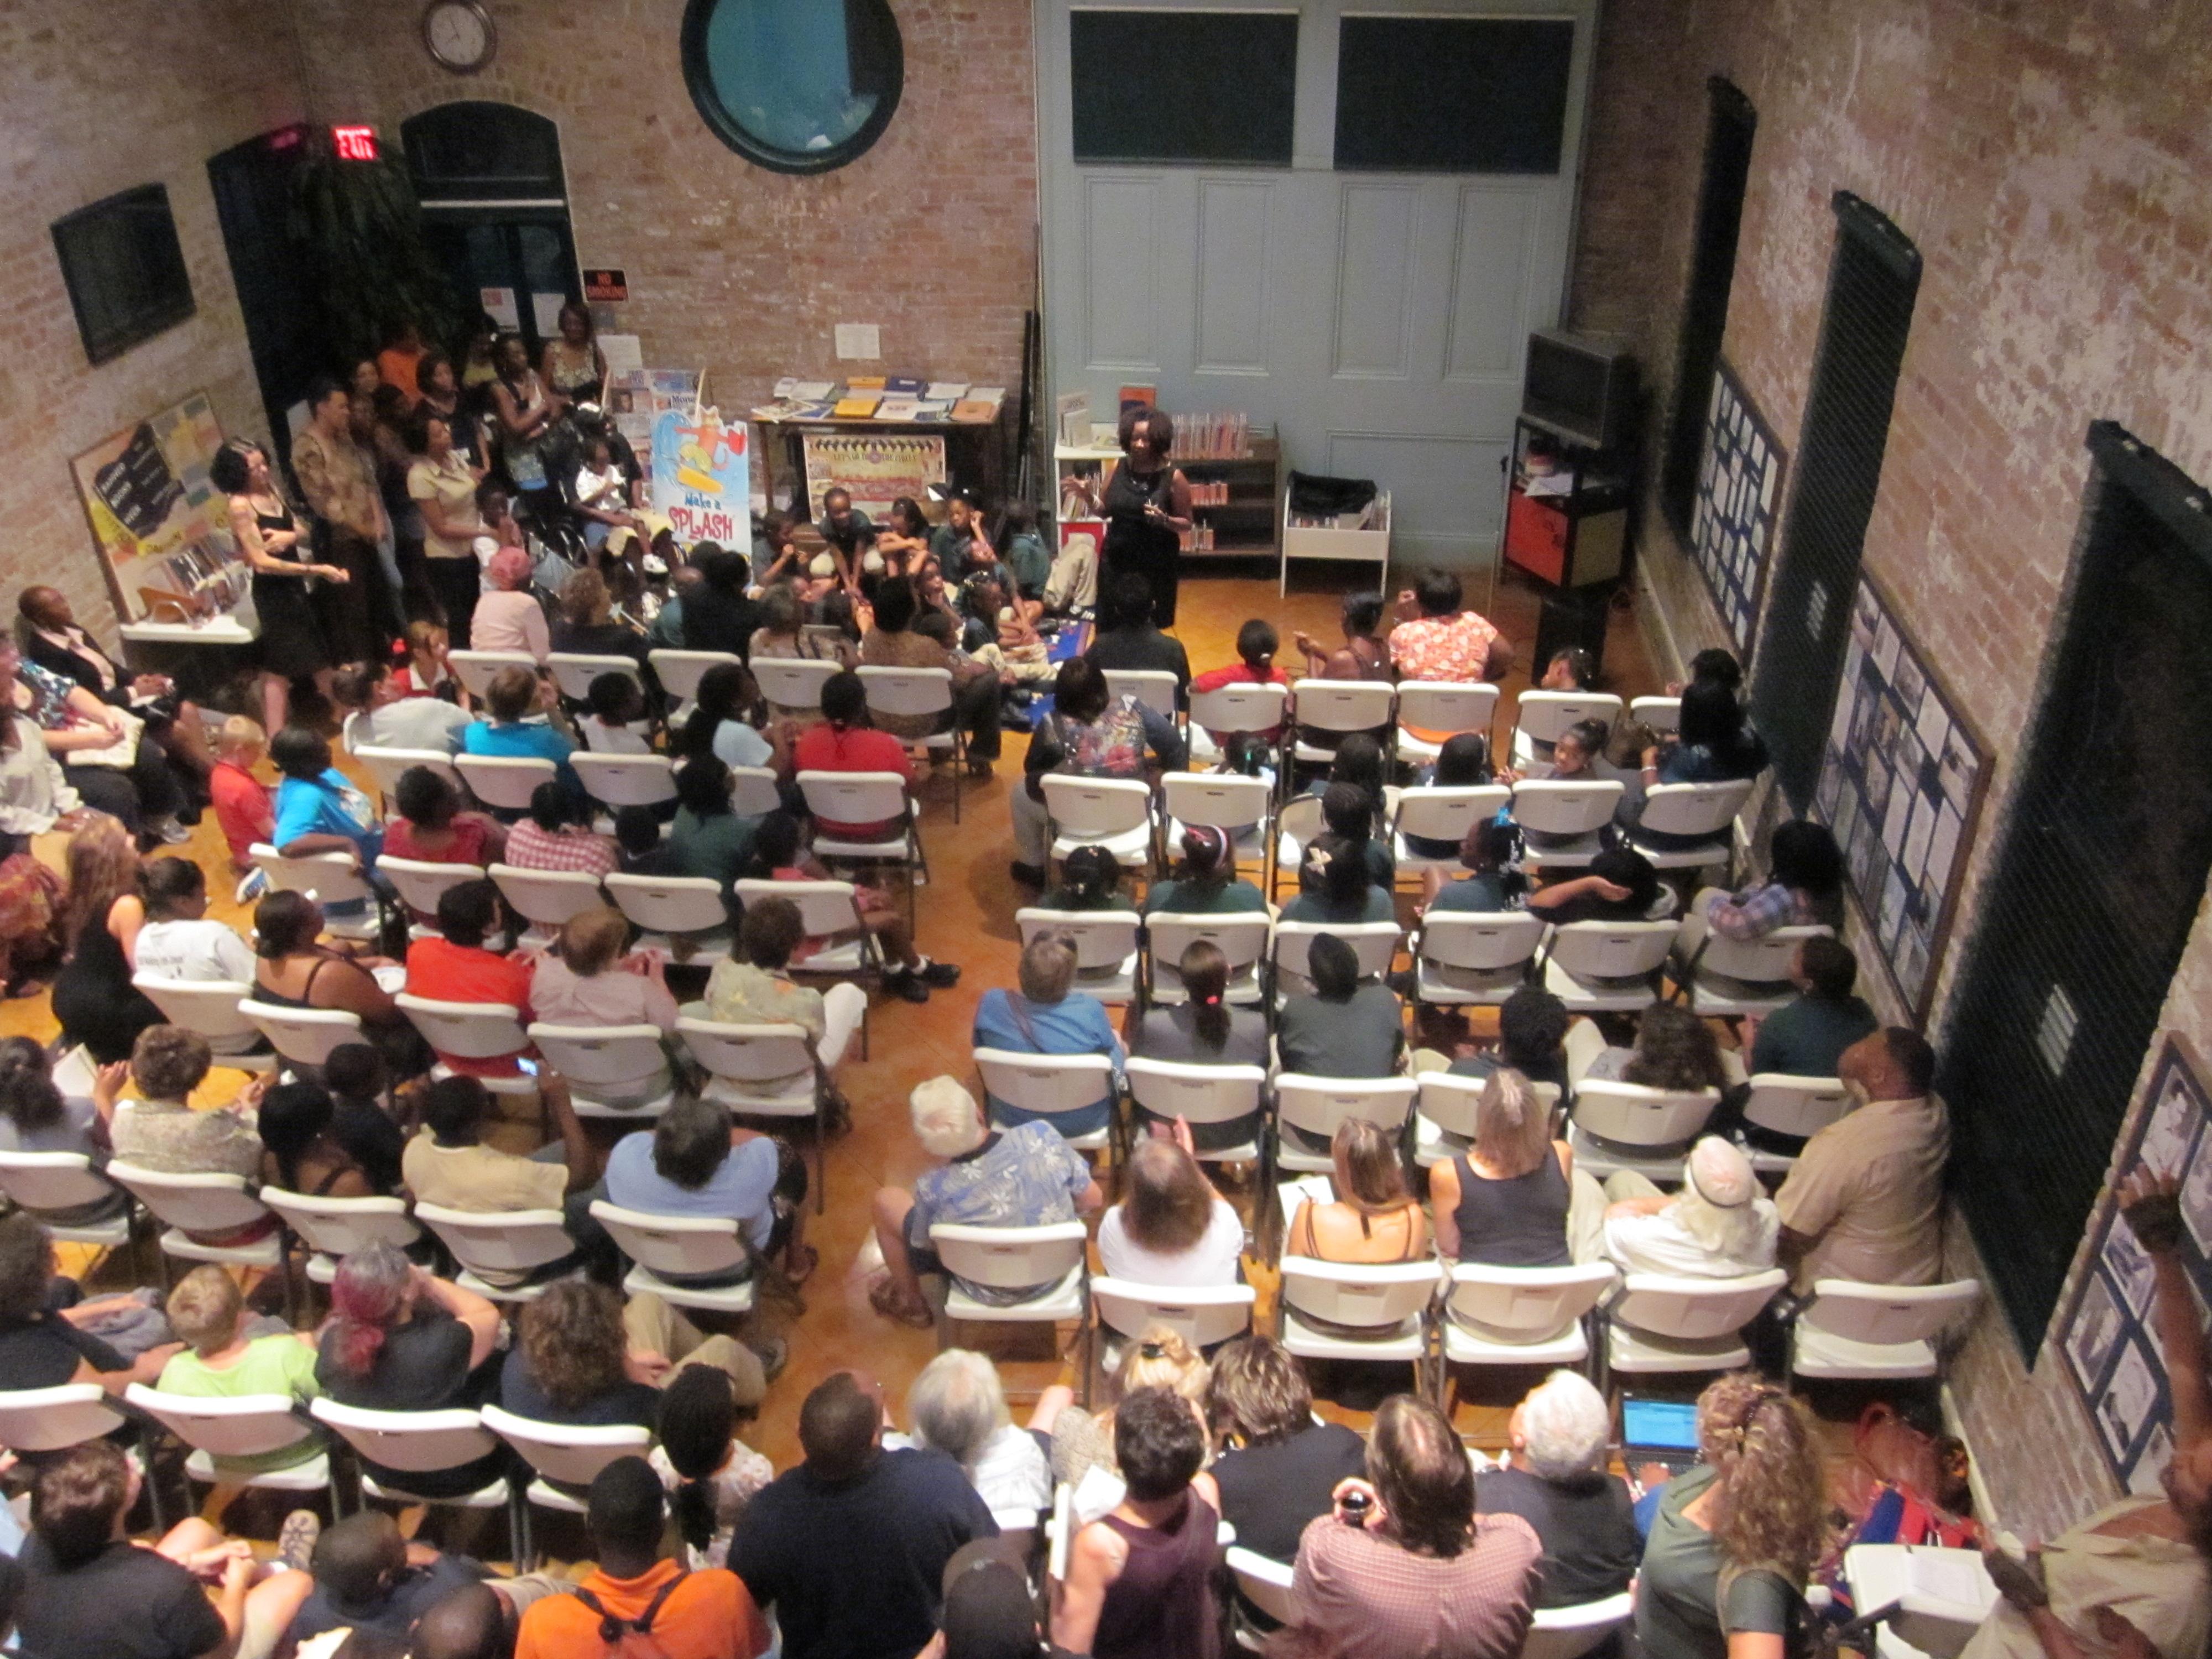 File:Ruby Bridges Hall crowd from balcony.JPG - Wikimedia Commons